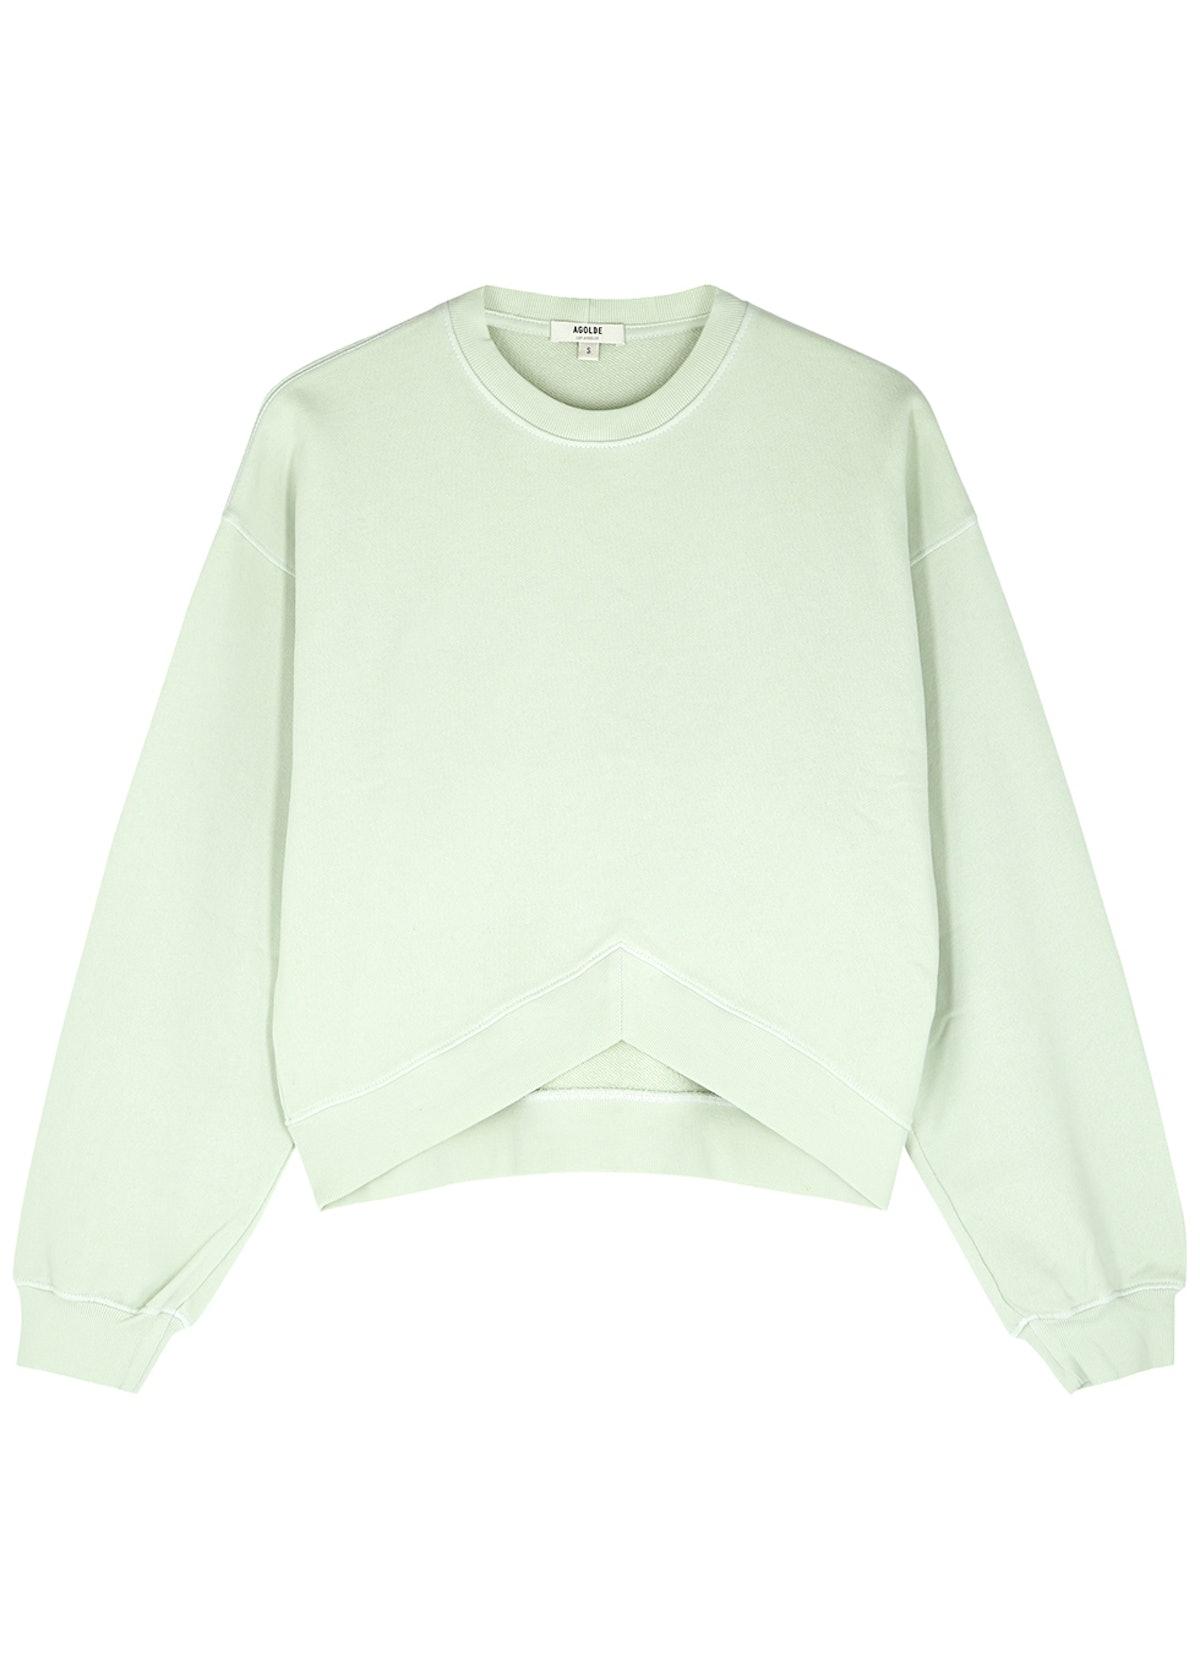 Mint green cotton sweatshirt: image 1